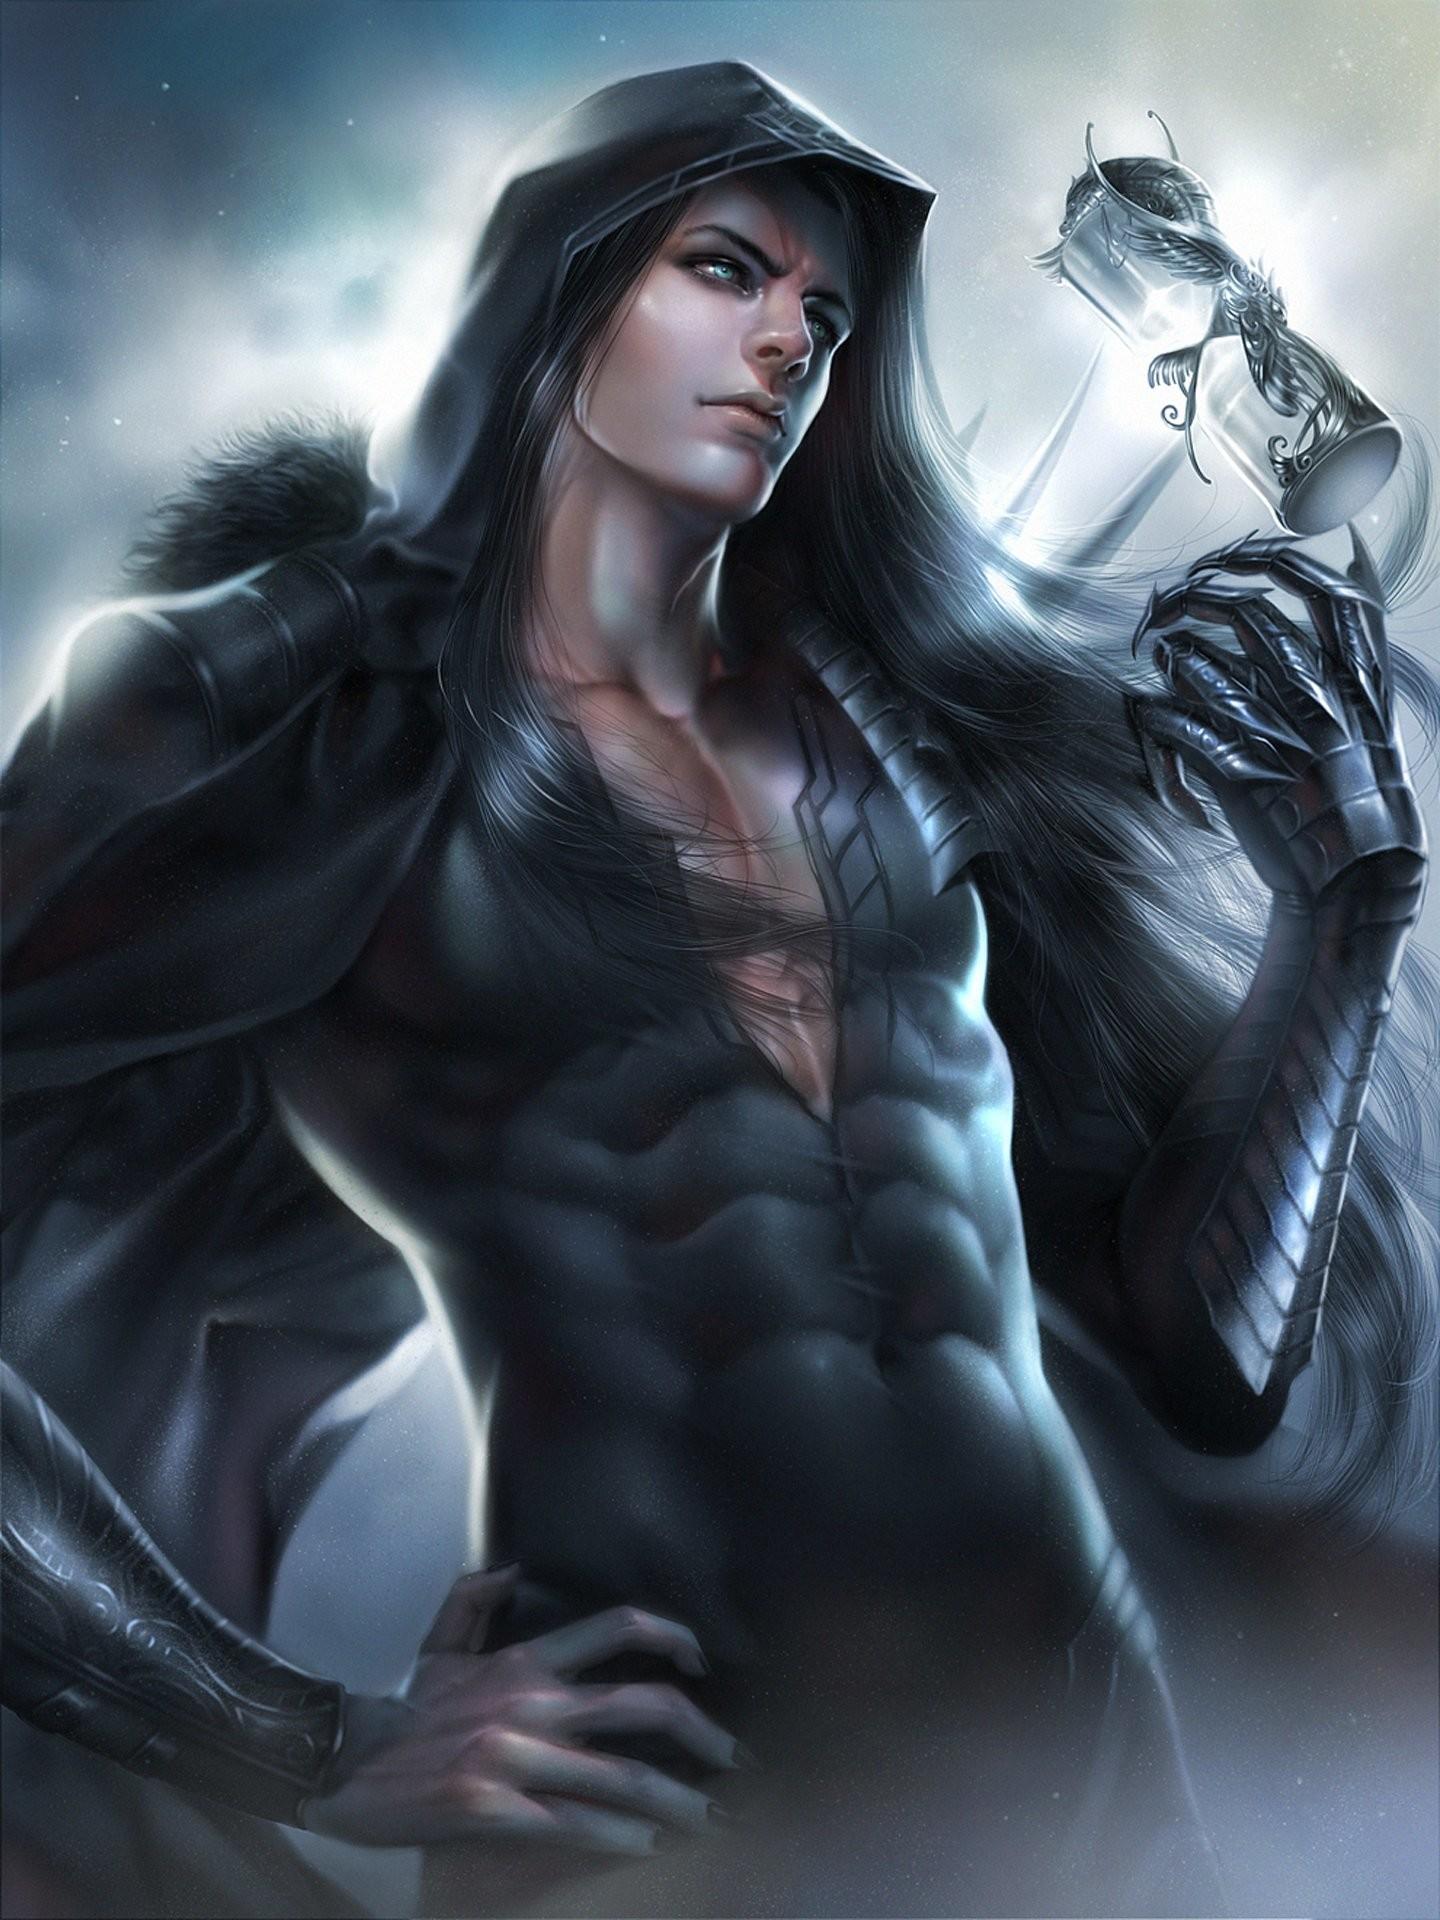 Original fantasy male zeilyan long hair blue eyes wallpaper | |  589500 | WallpaperUP